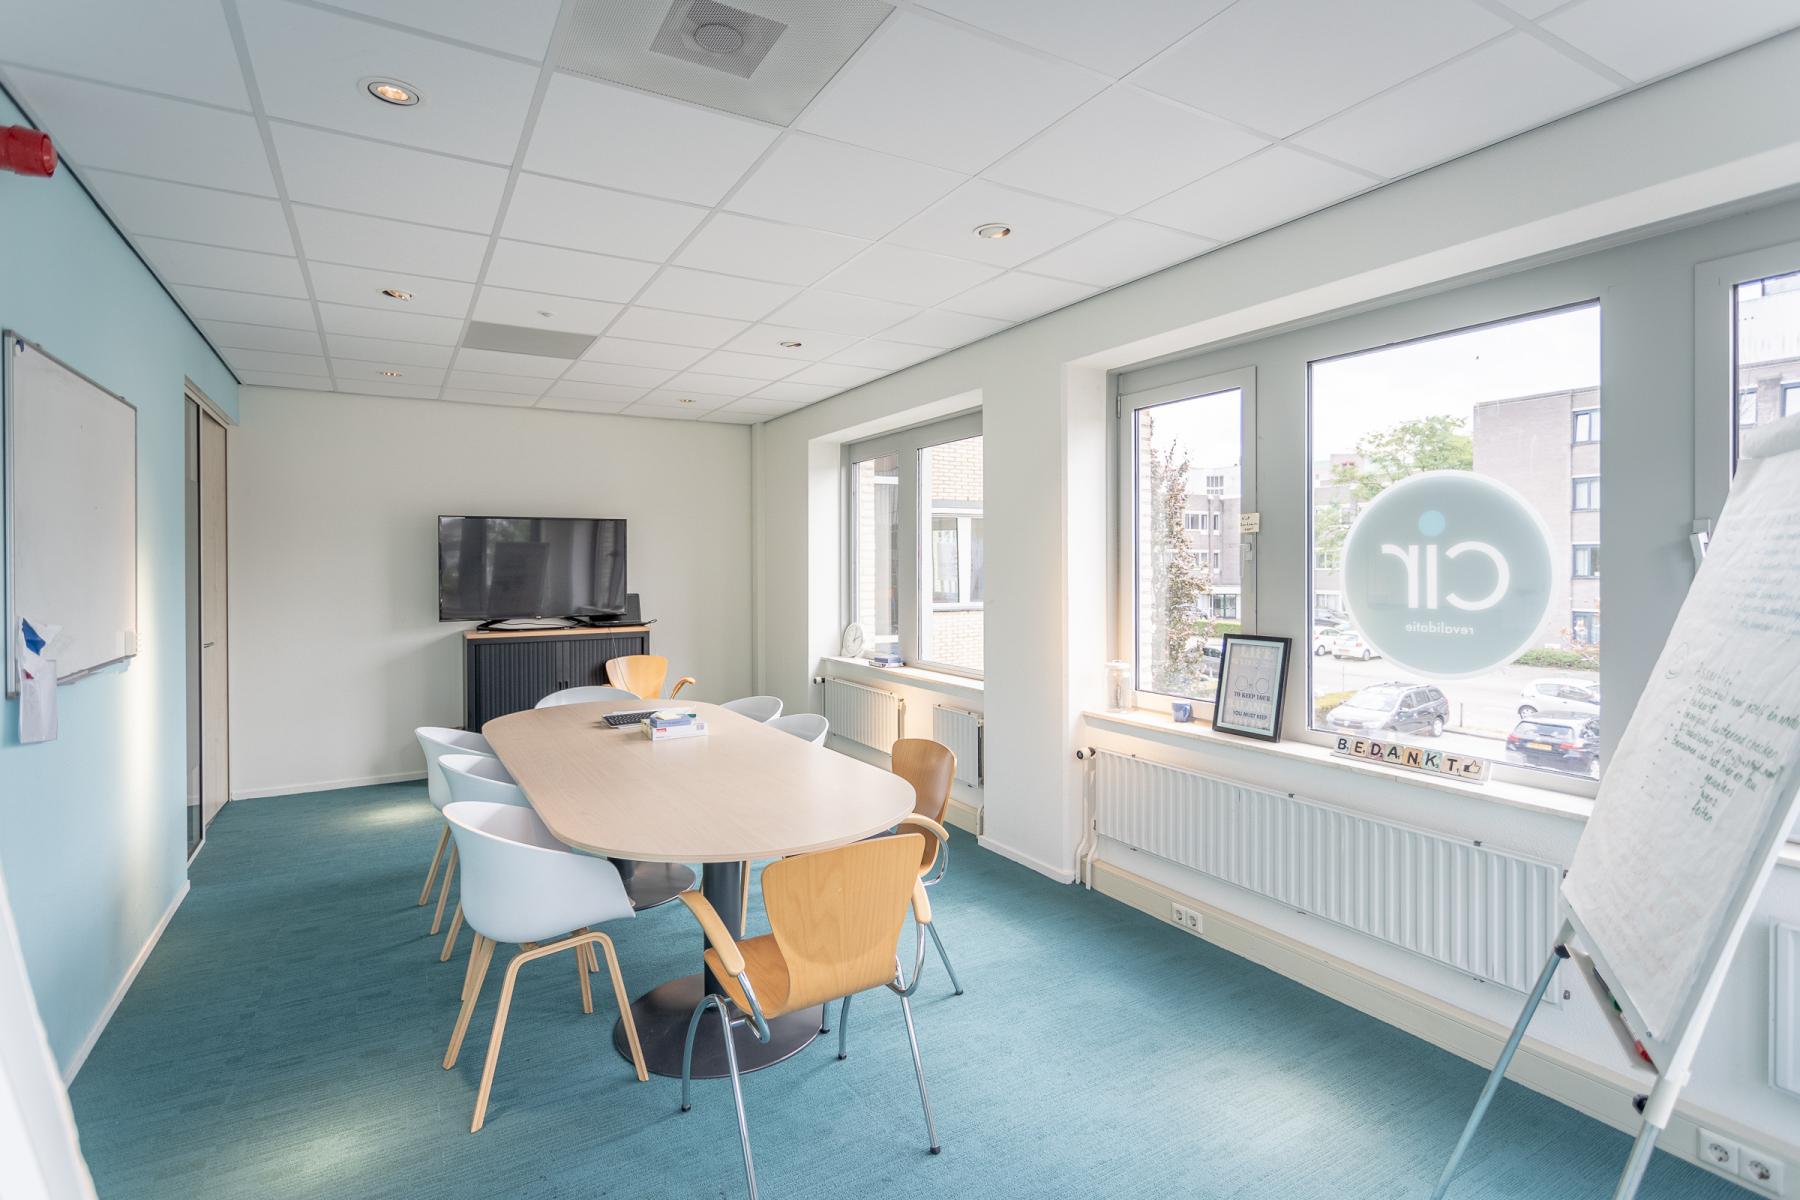 Rent office space Dokter Stolteweg 42, Zwolle (5)